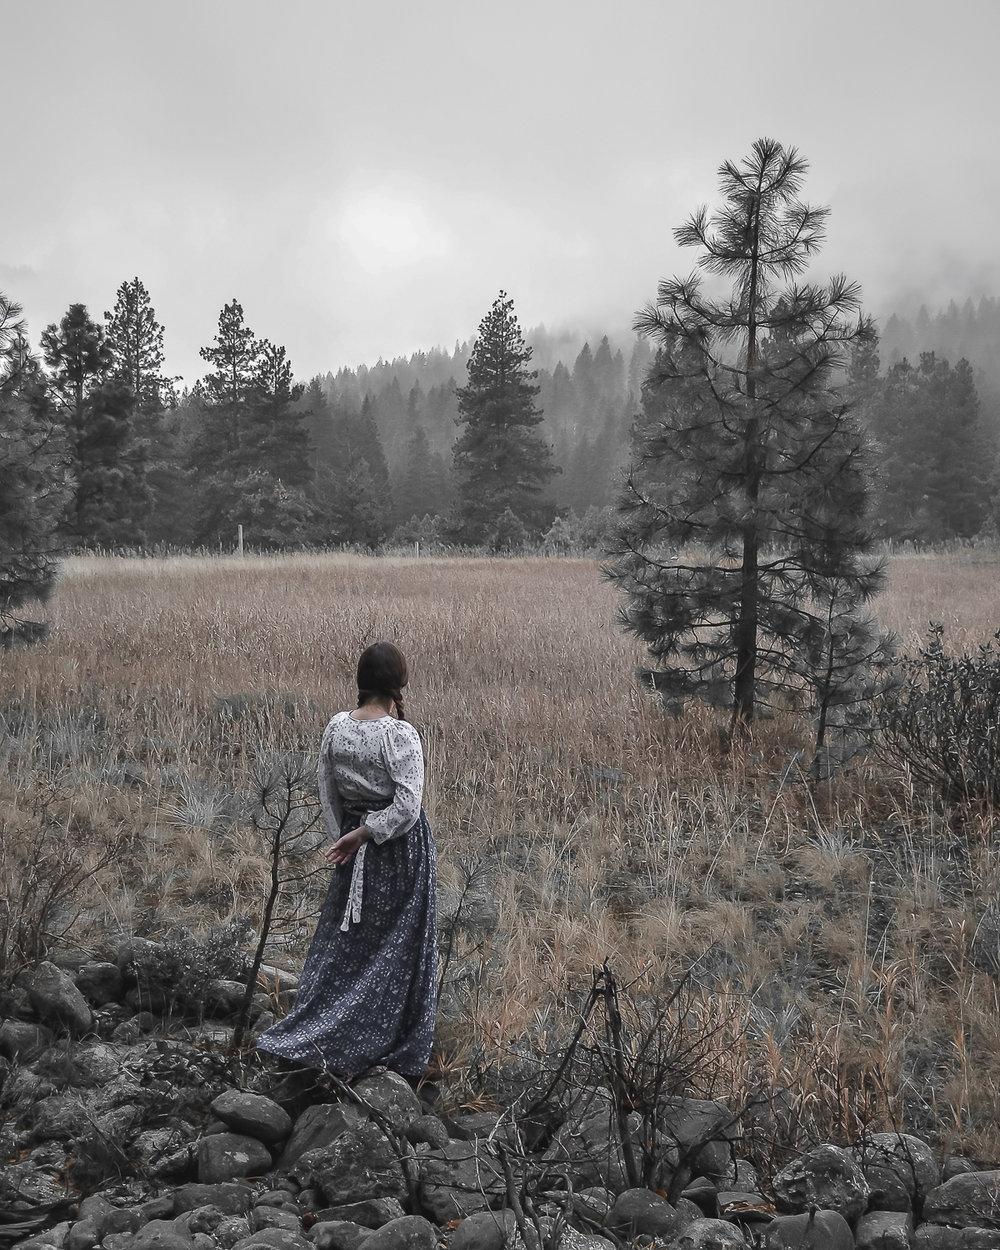 sarahbsmithart-dreams-ghosts--8.jpg